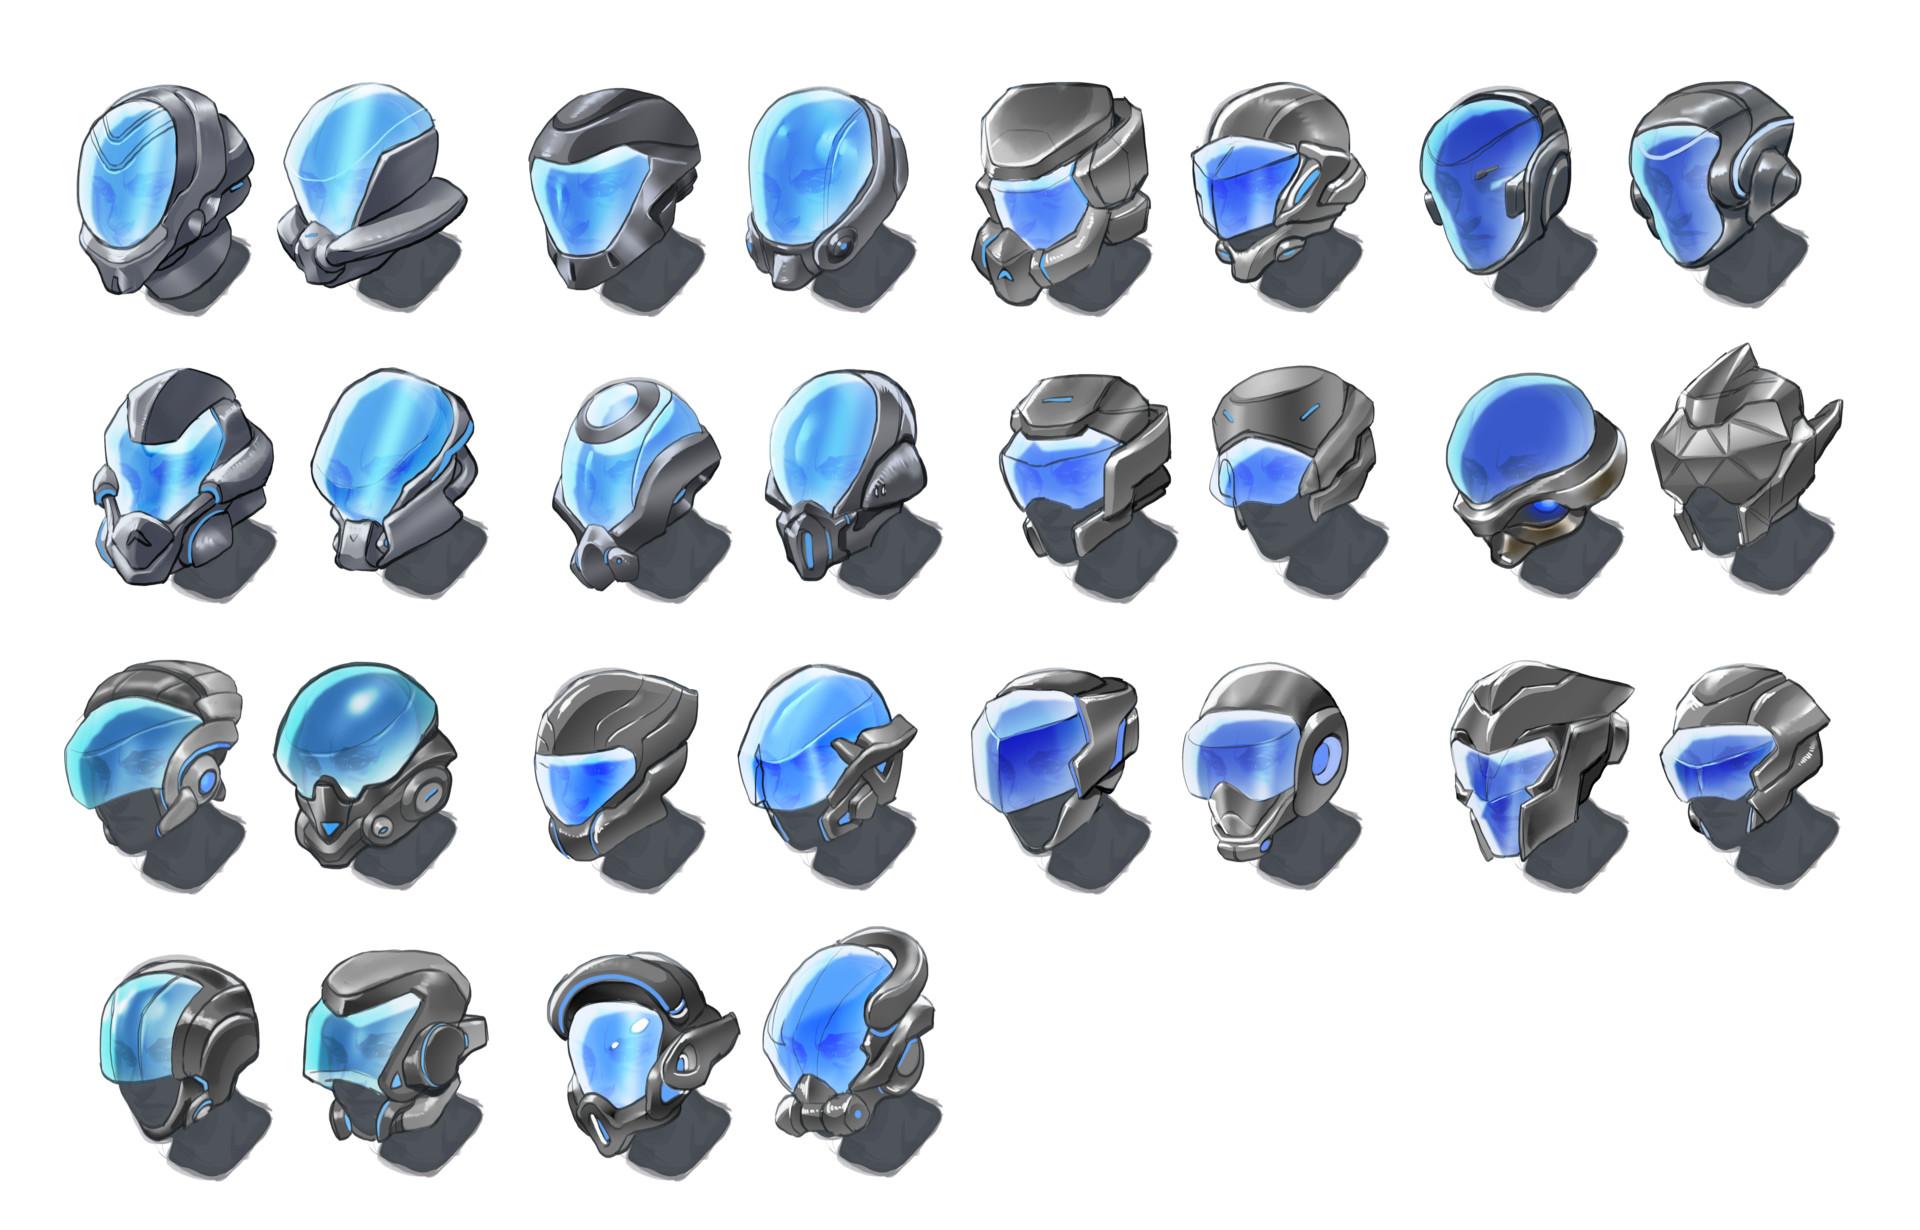 Meta olympia mightydynamo helmets